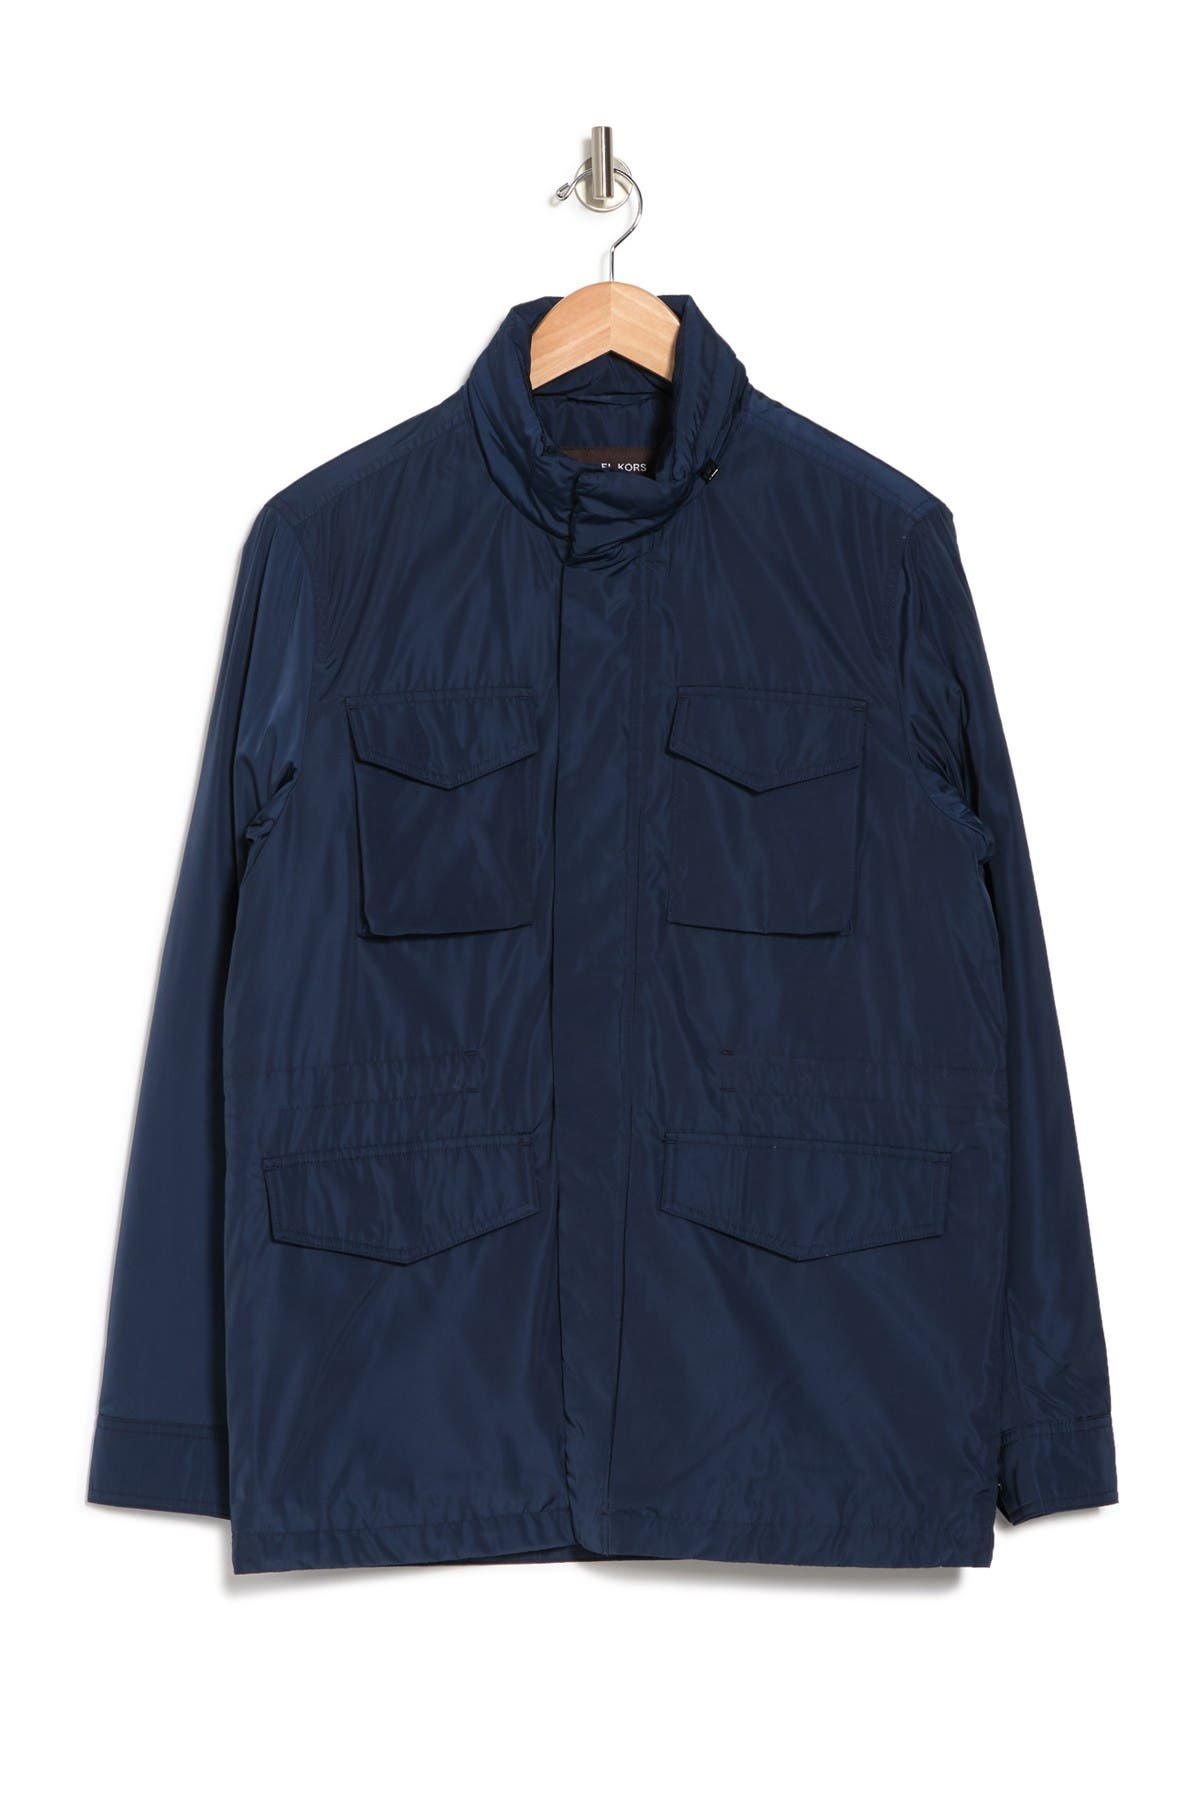 Image of Michael Kors Short Nylon Field Jacket